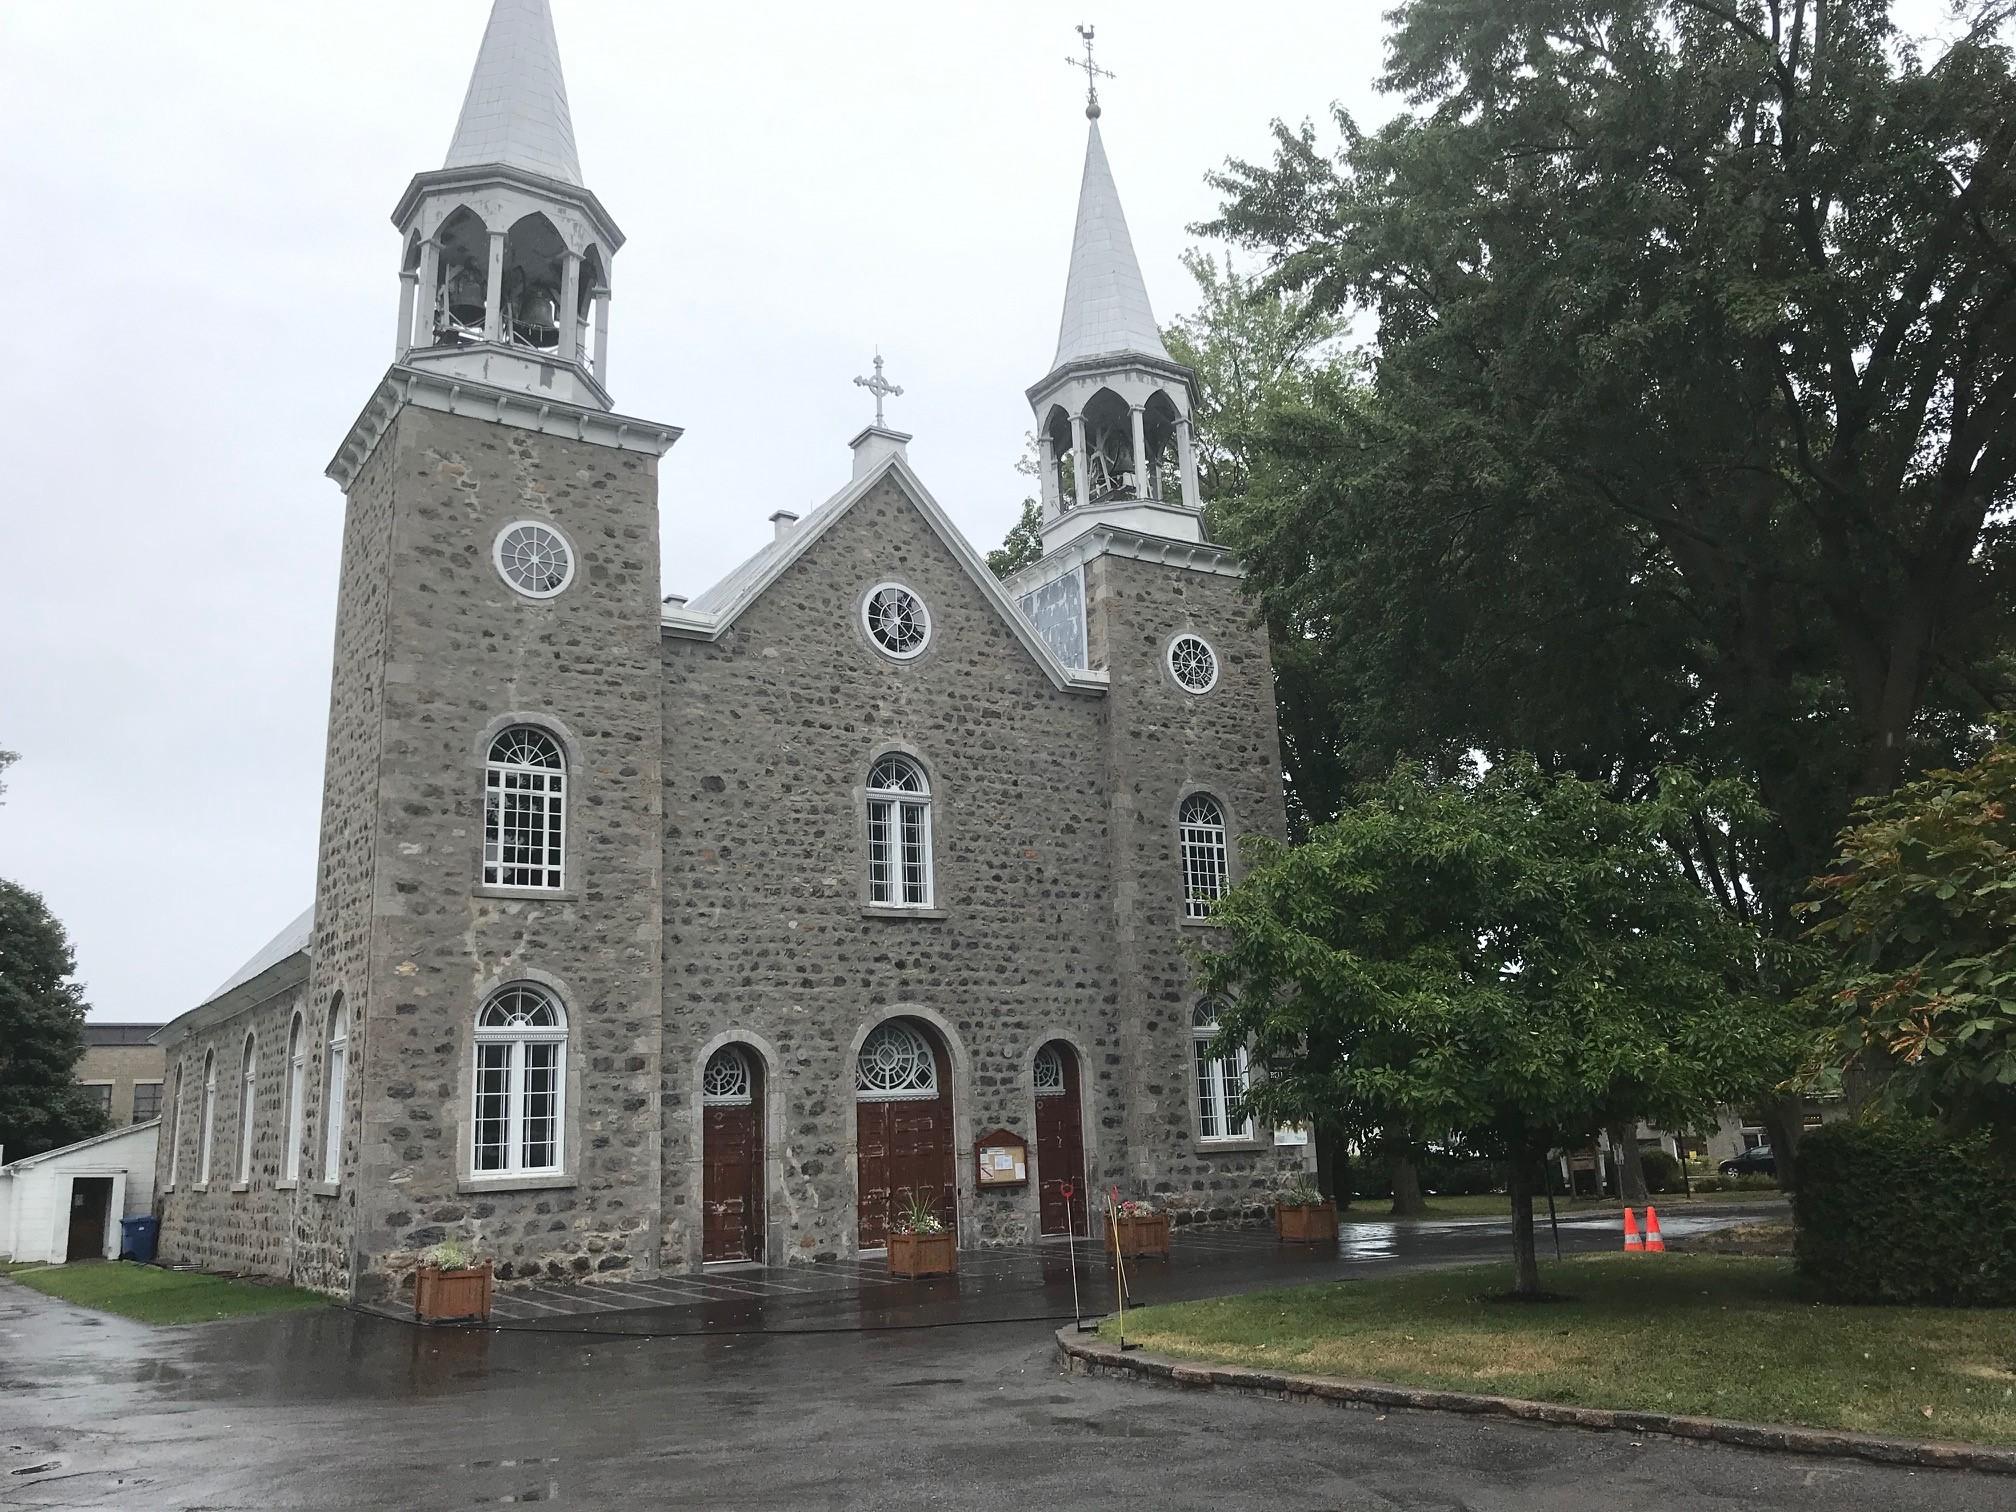 Eglise de la Purification